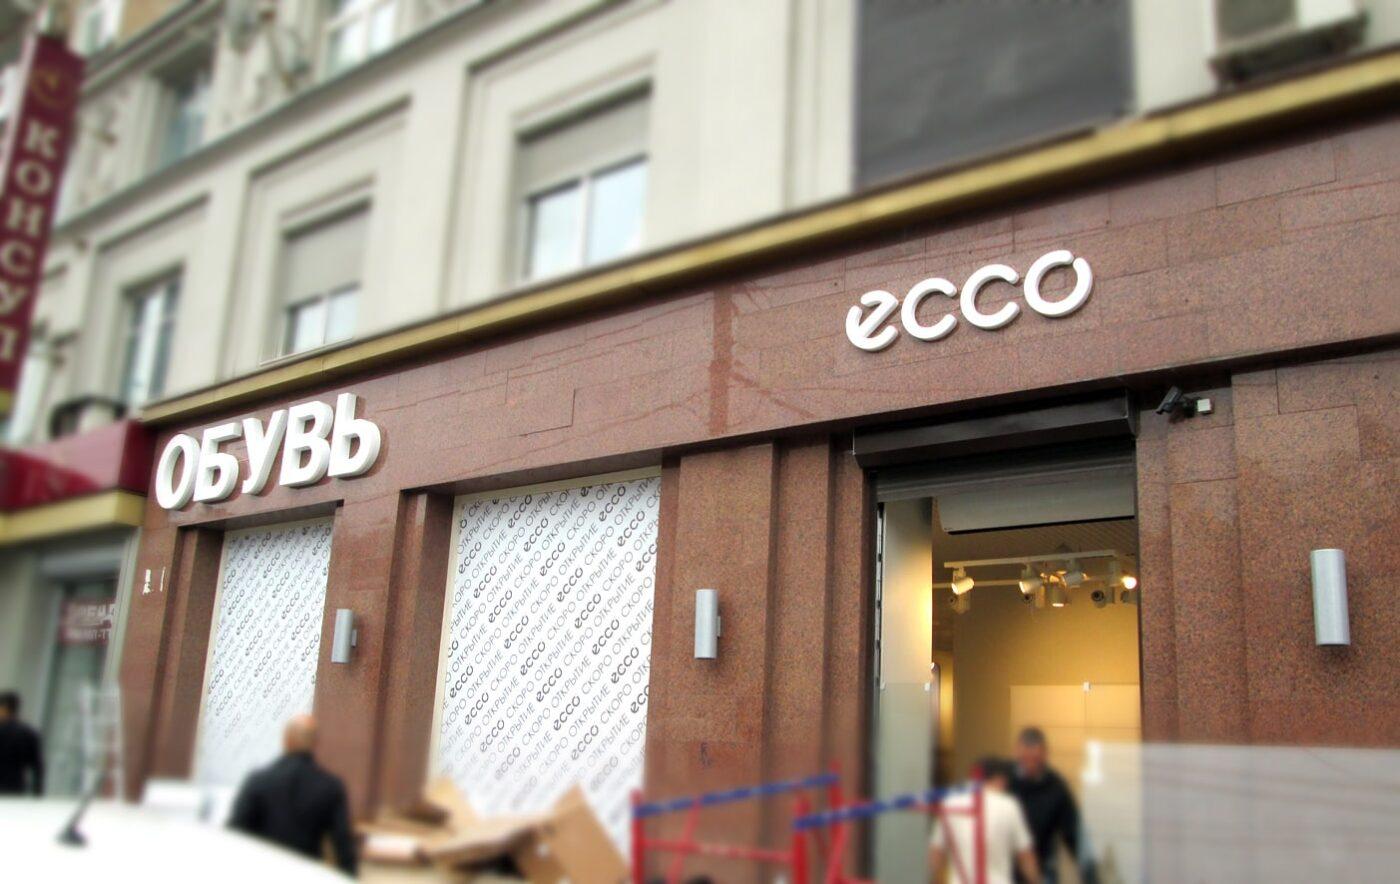 Ecco вывеска магазина обуви